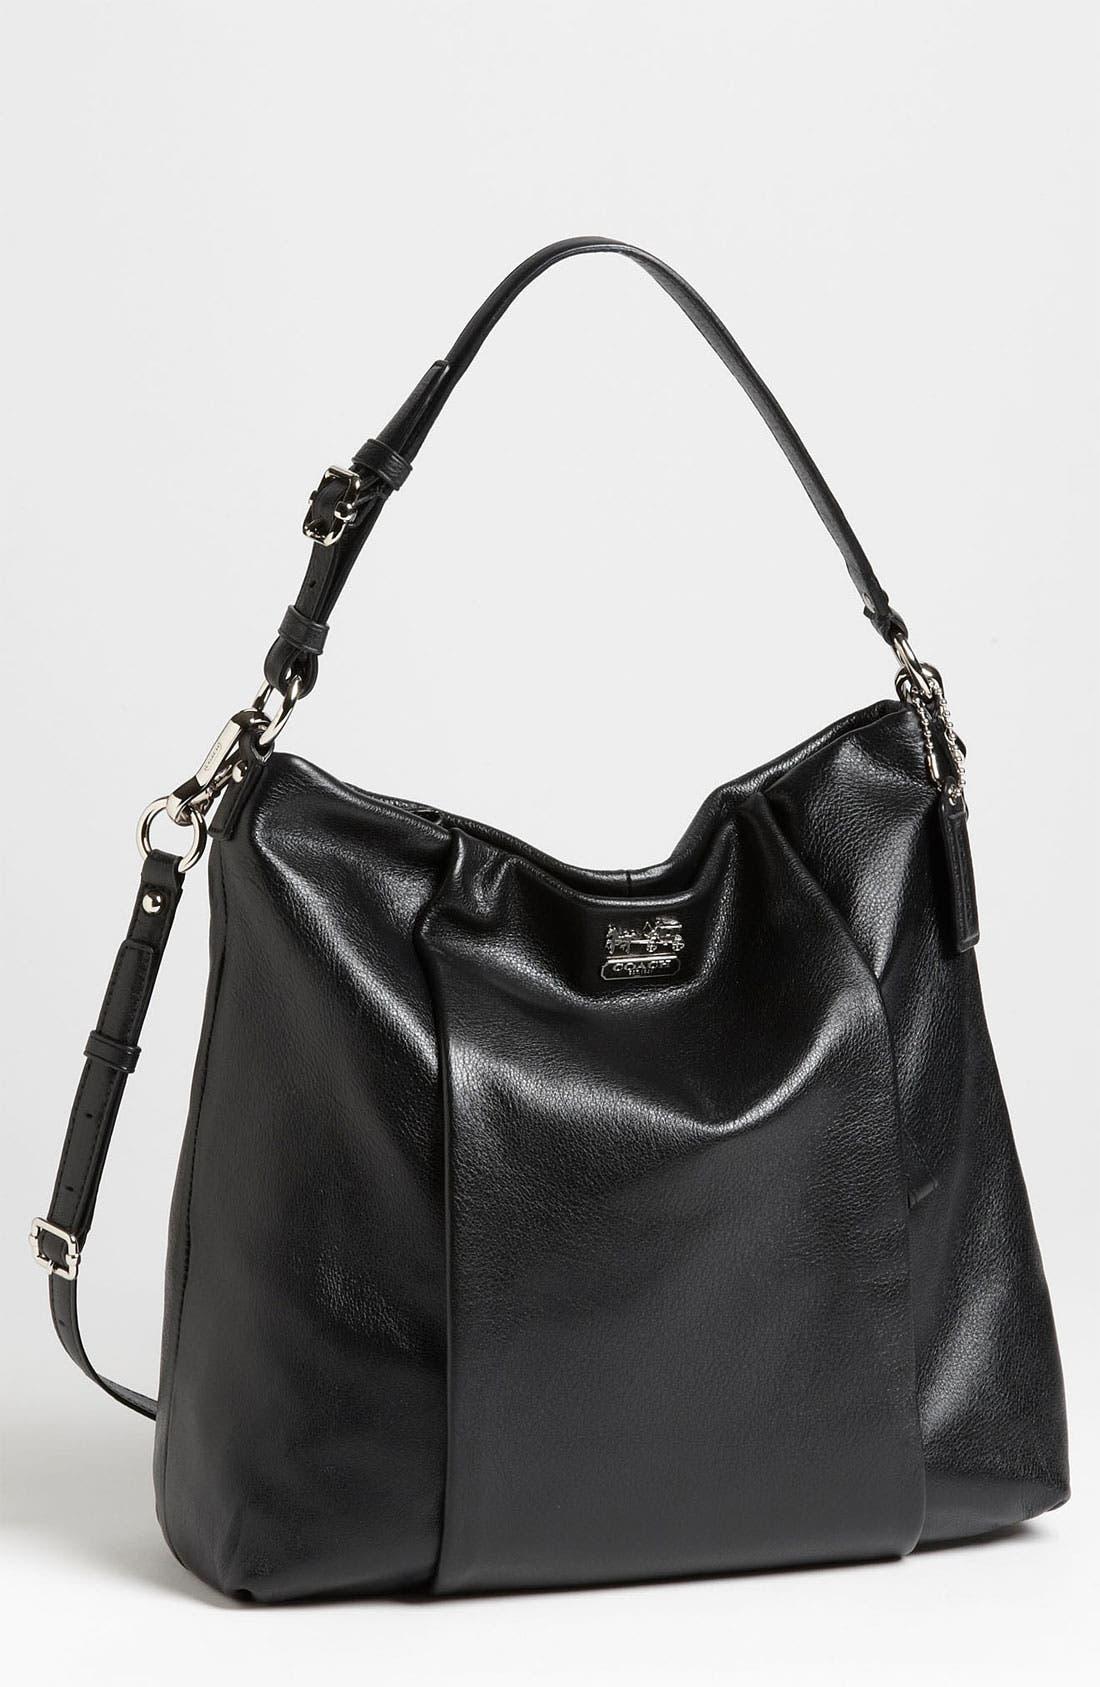 Main Image - COACH 'New Madison - Isabelle' Leather Shoulder Bag